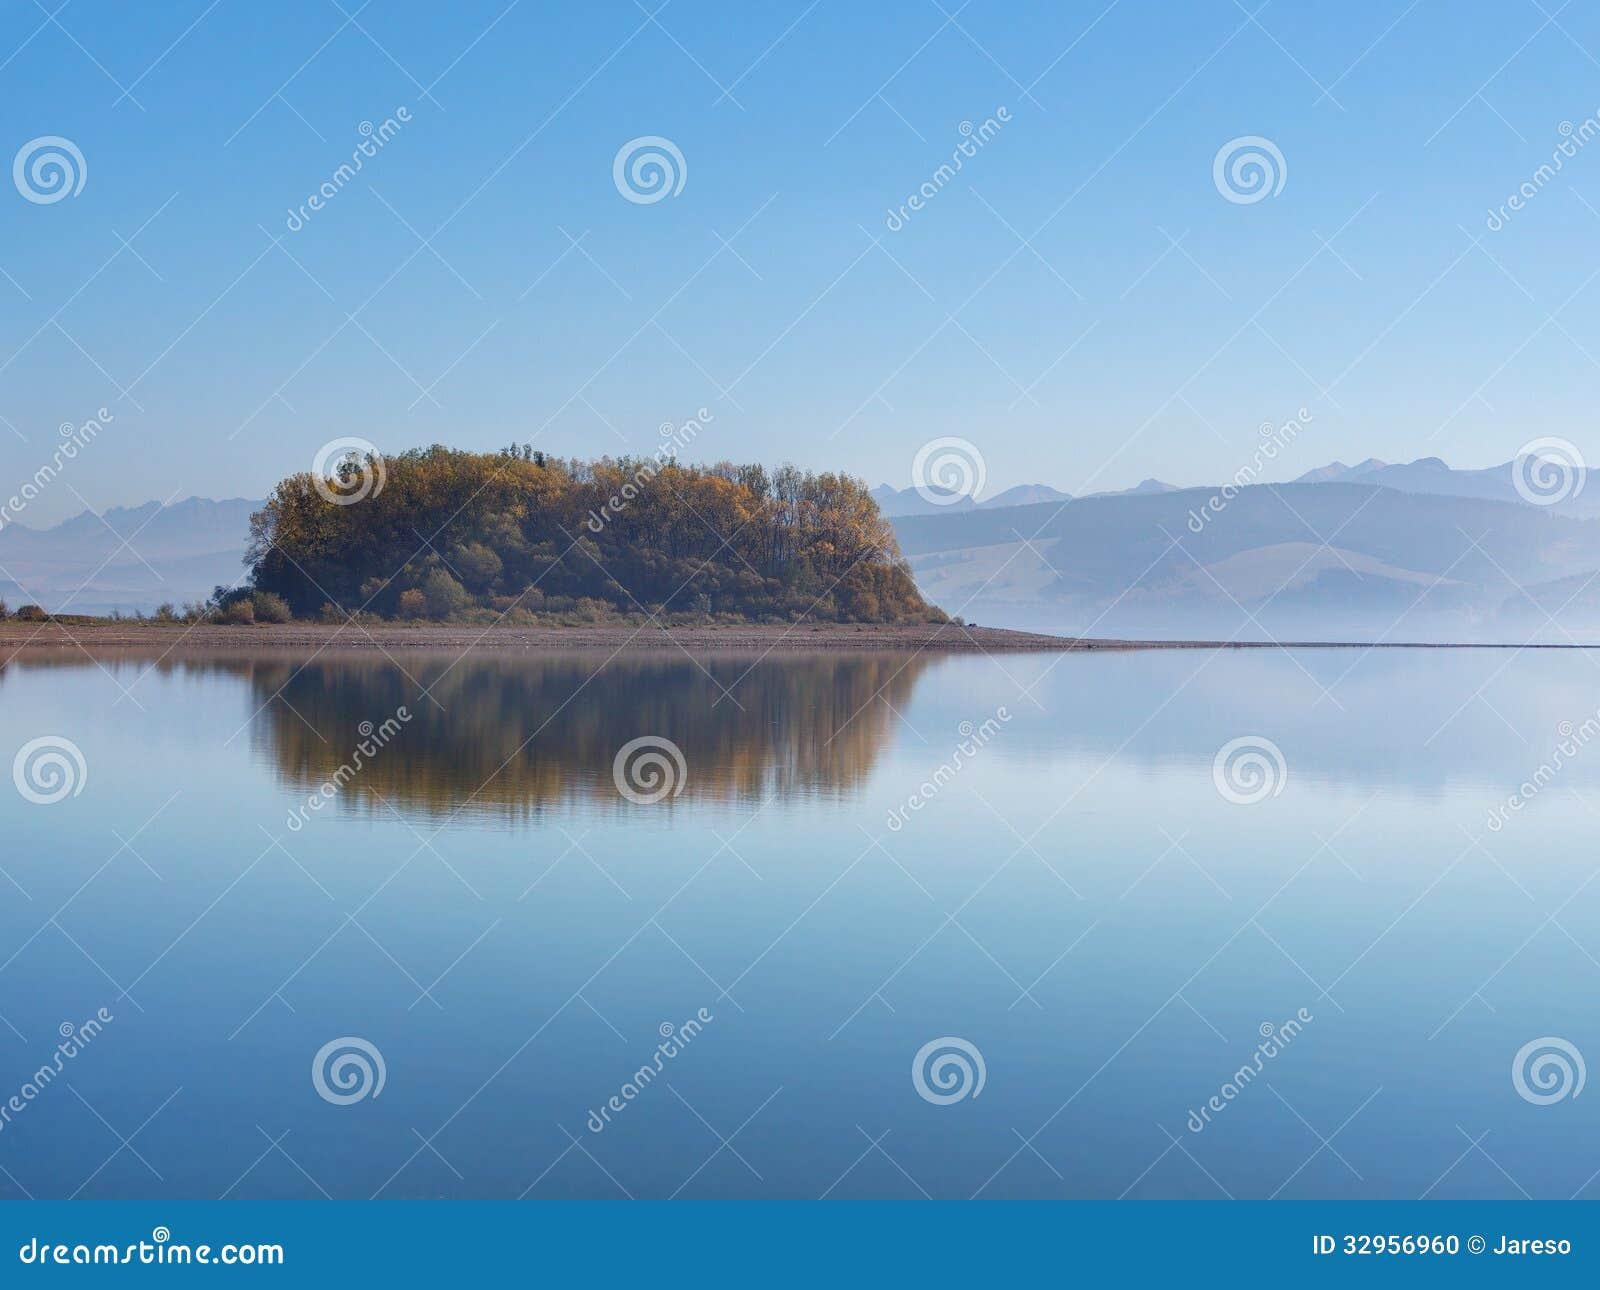 Slanica Island early in the morning